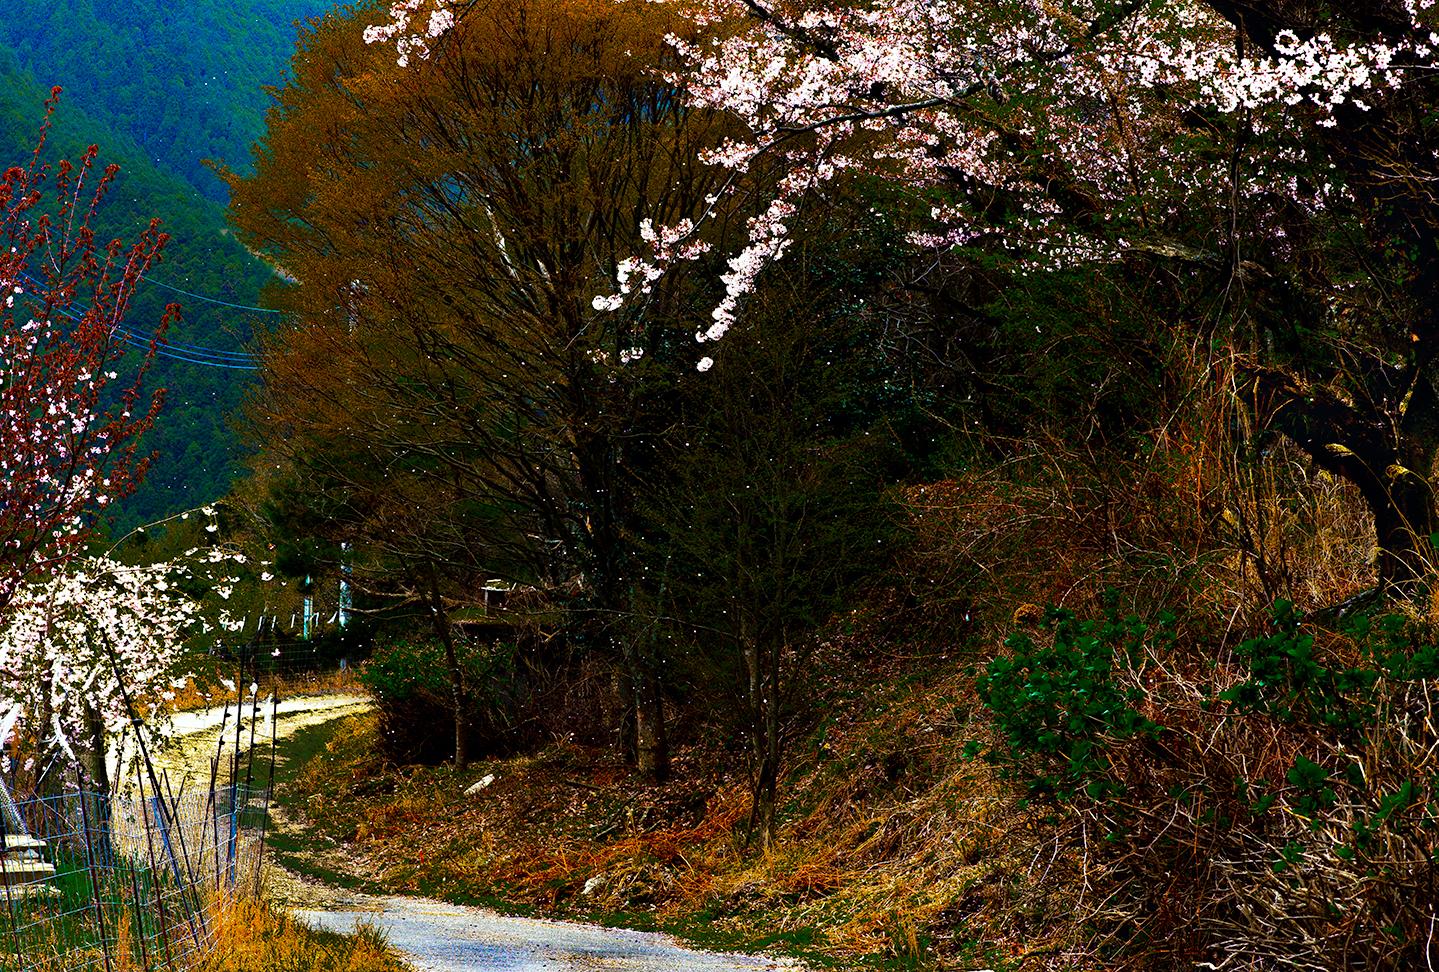 Falling CherryBlossom